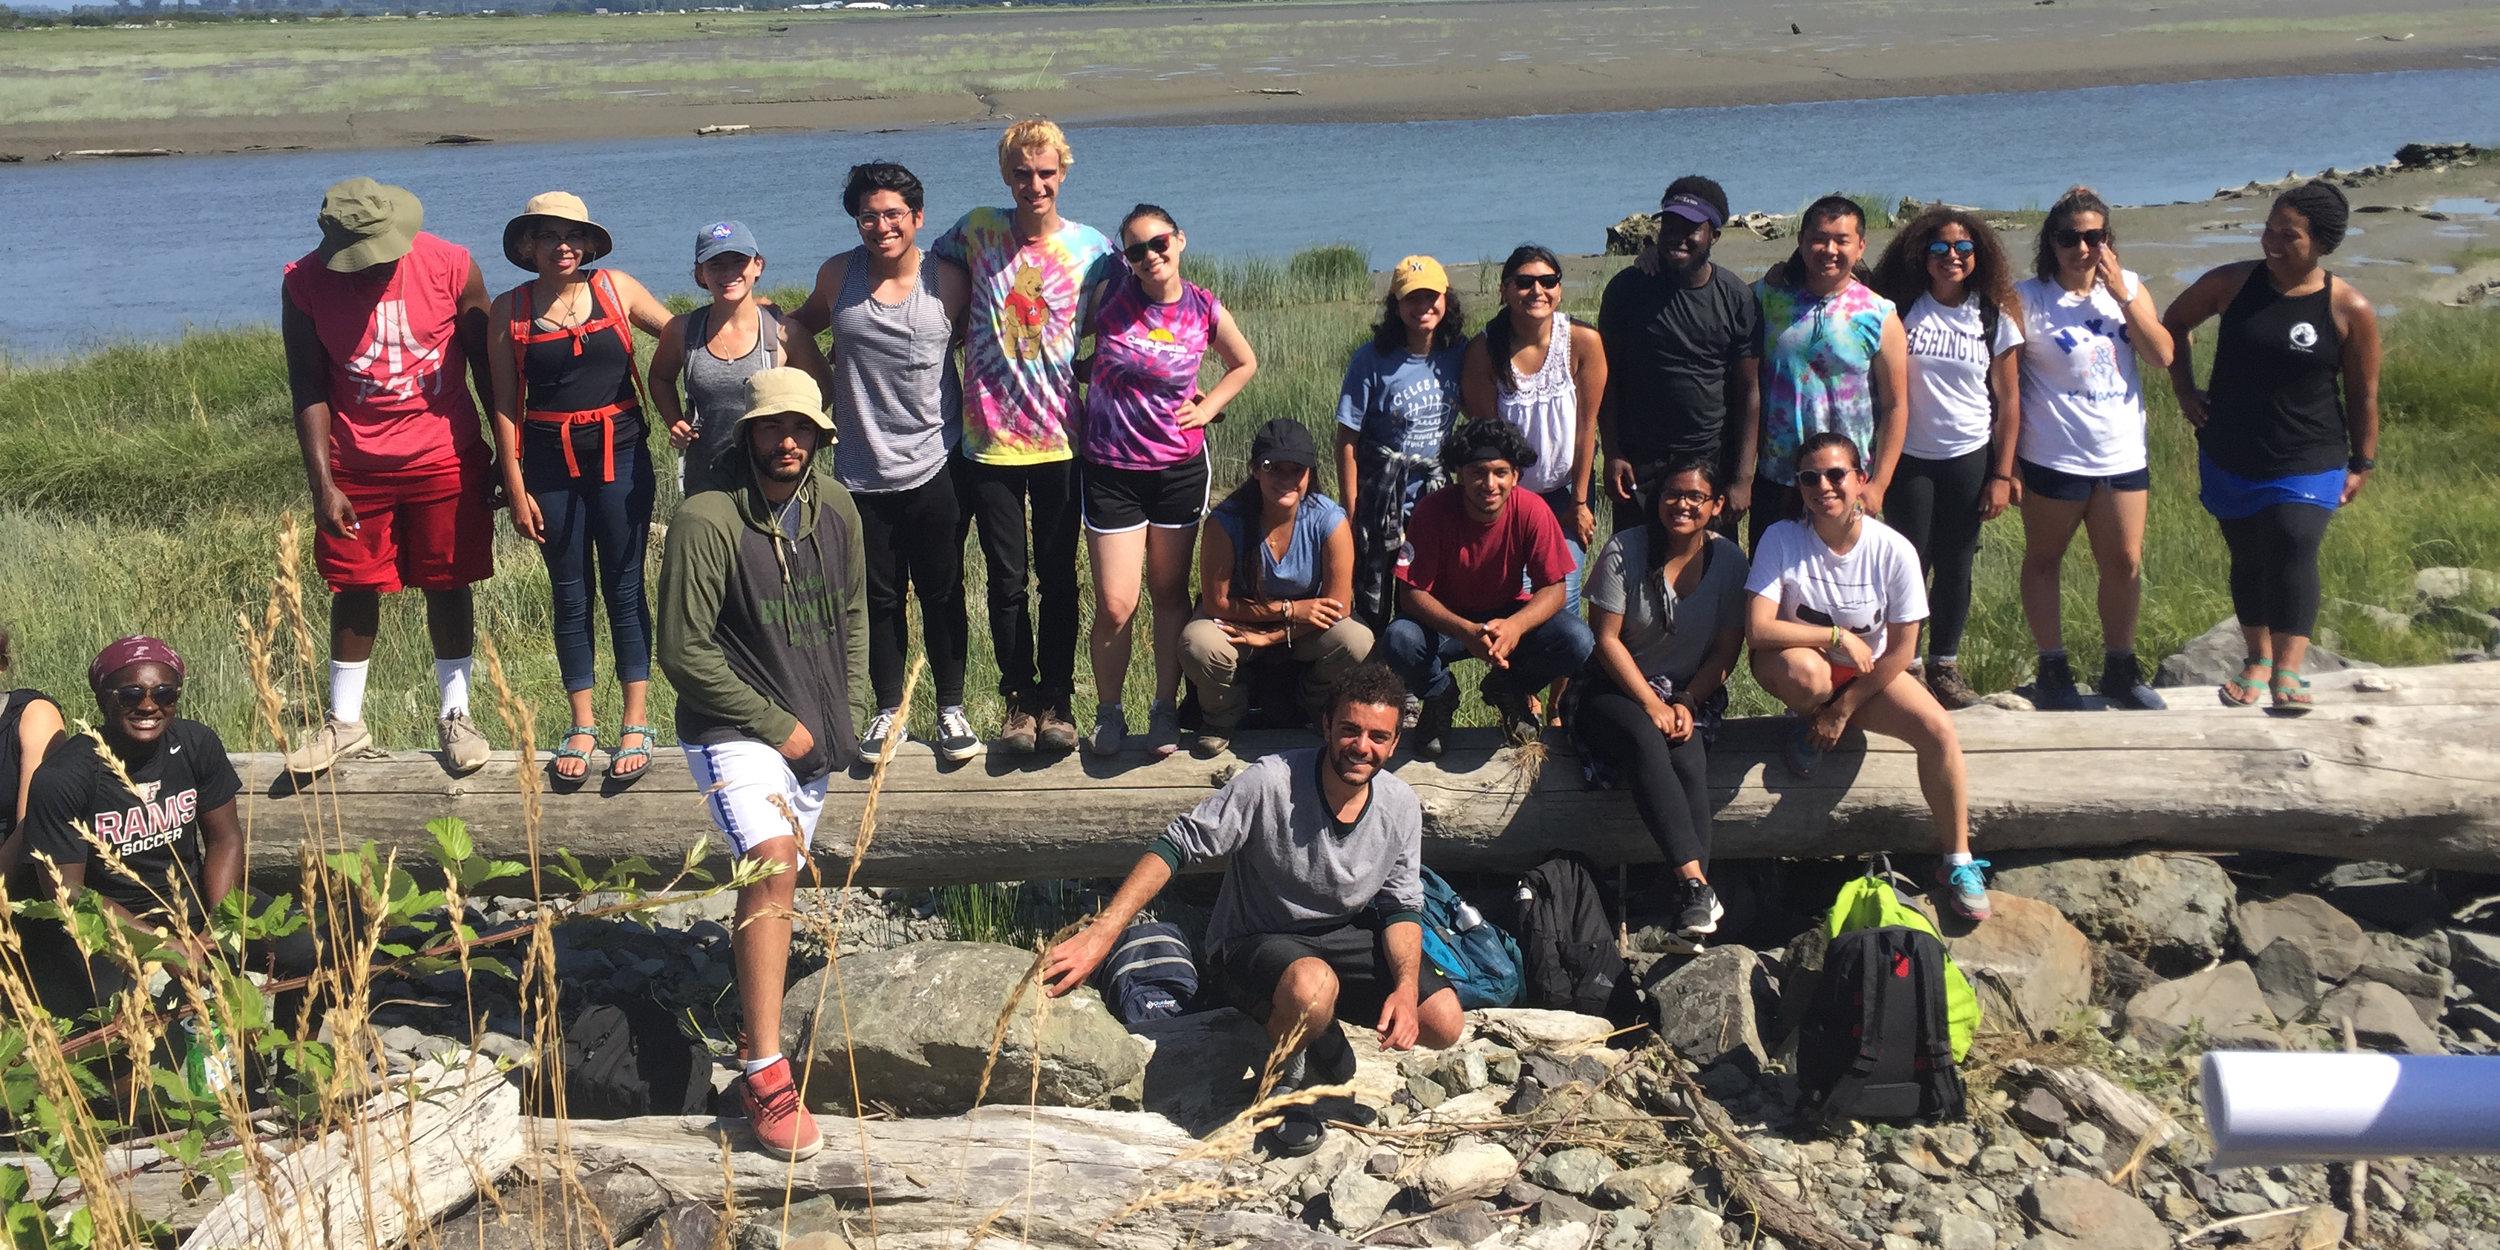 Doris Duke Conservation Scholars touring the Skagit Valley. © TNC